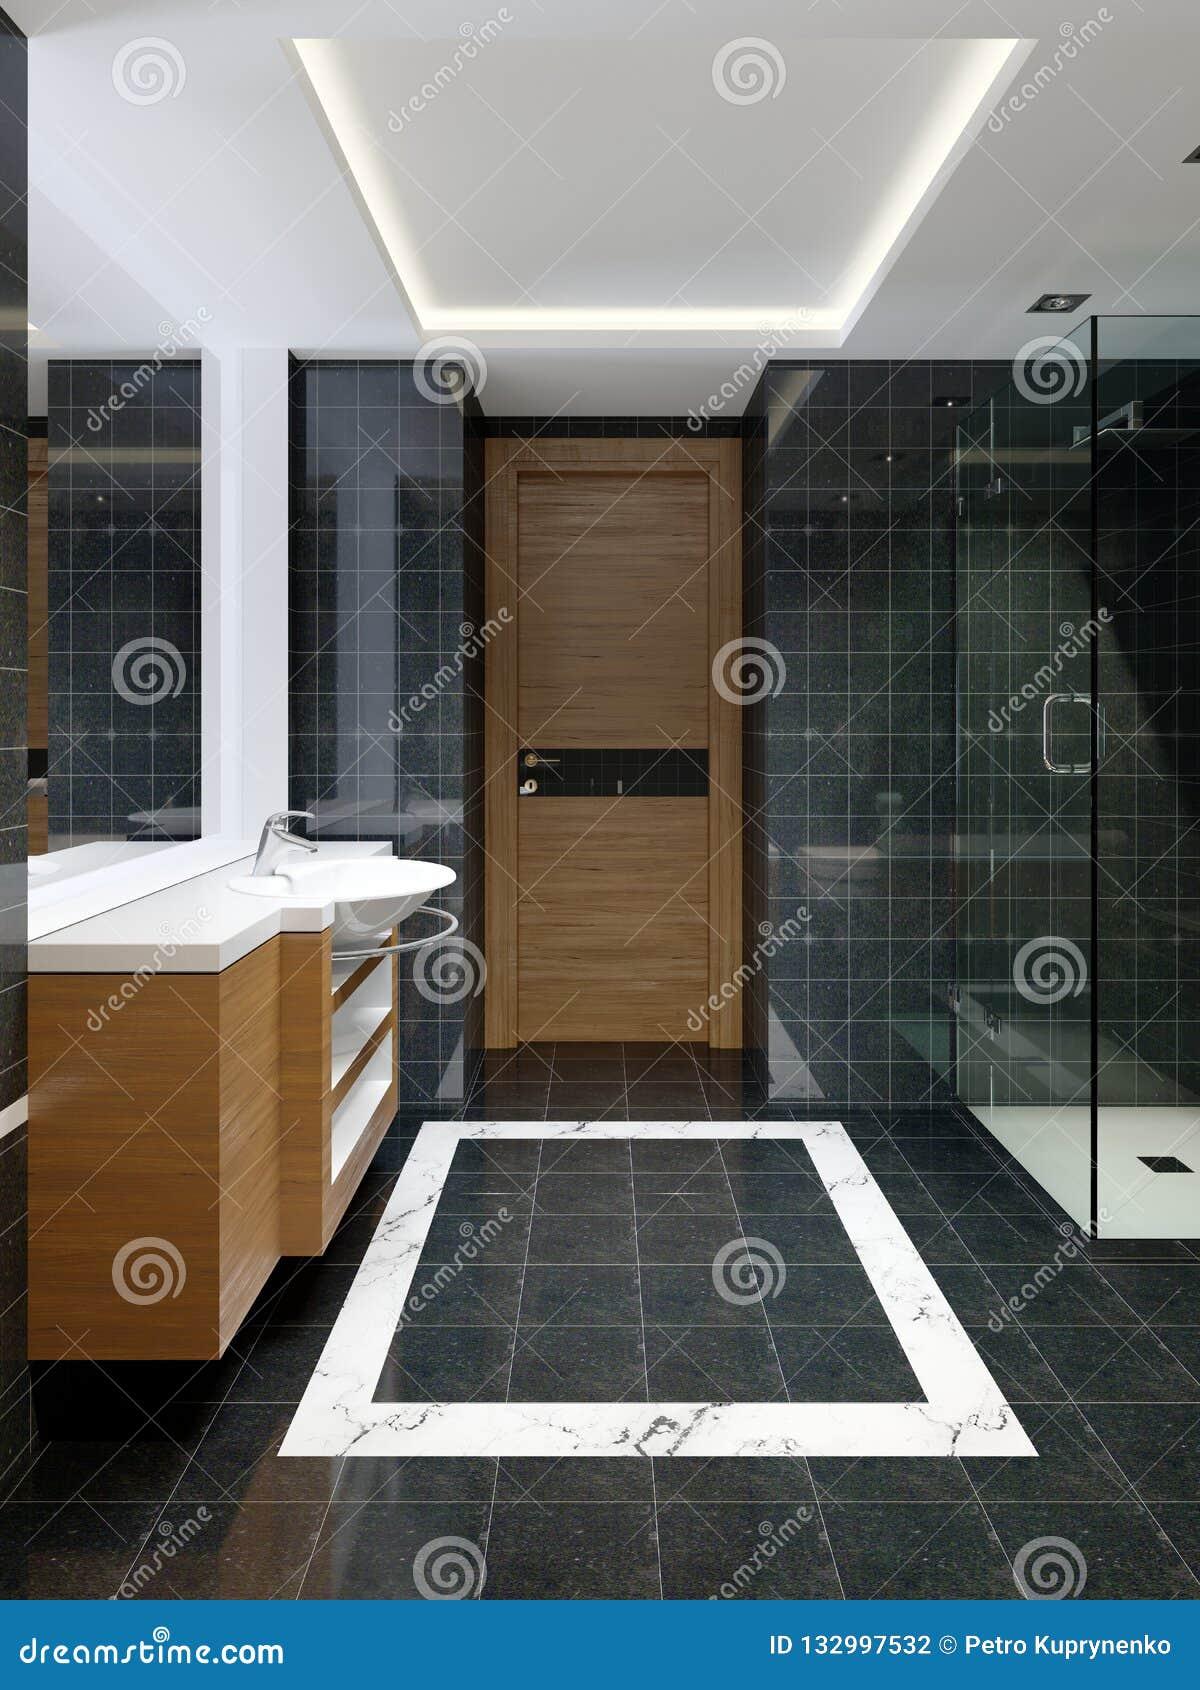 Modern Bleack And White Designer Bathroom With Black Marble Shower Tiling Stock Illustration Illustration Of Rendering Bollard 132997532